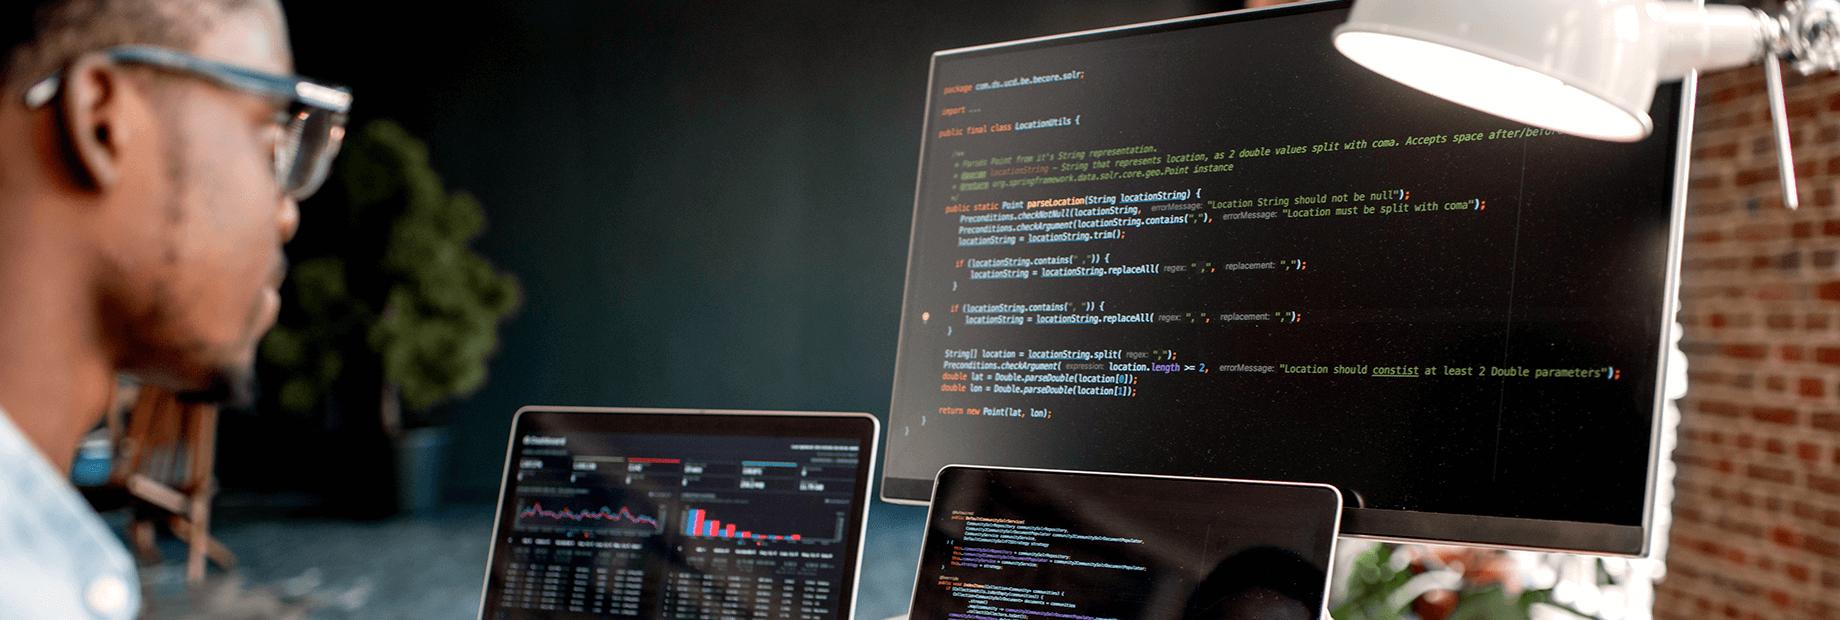 Web development employee working on computer